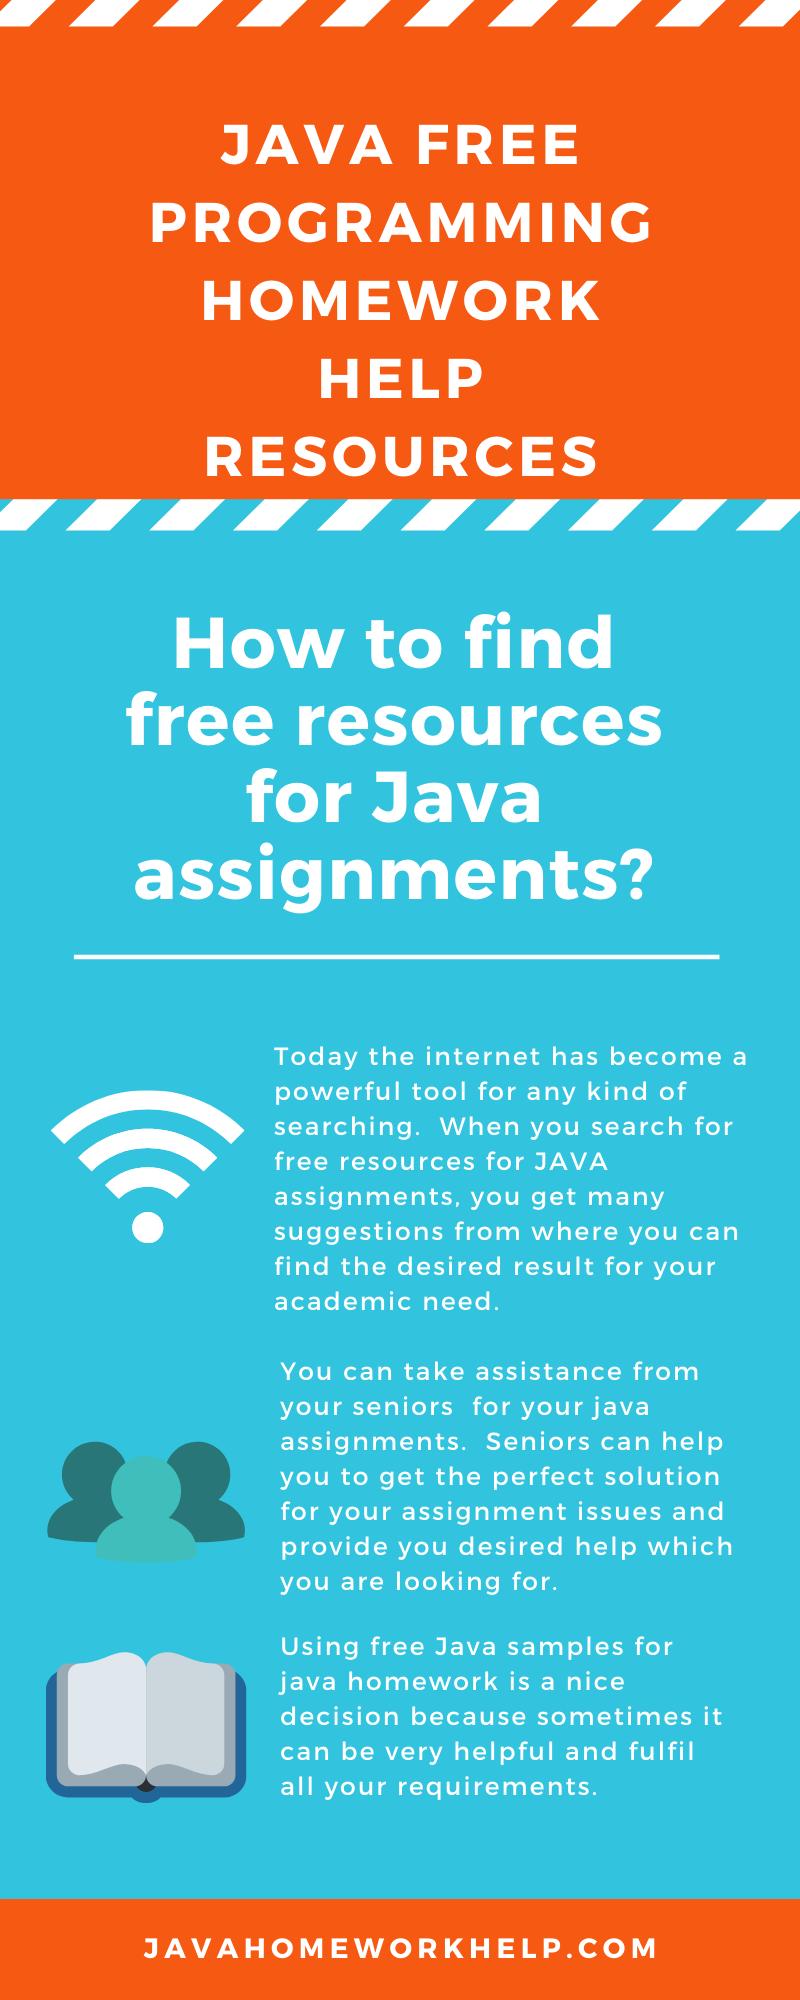 Java Assignment Help | Hire for Online Java Programming Homework Help